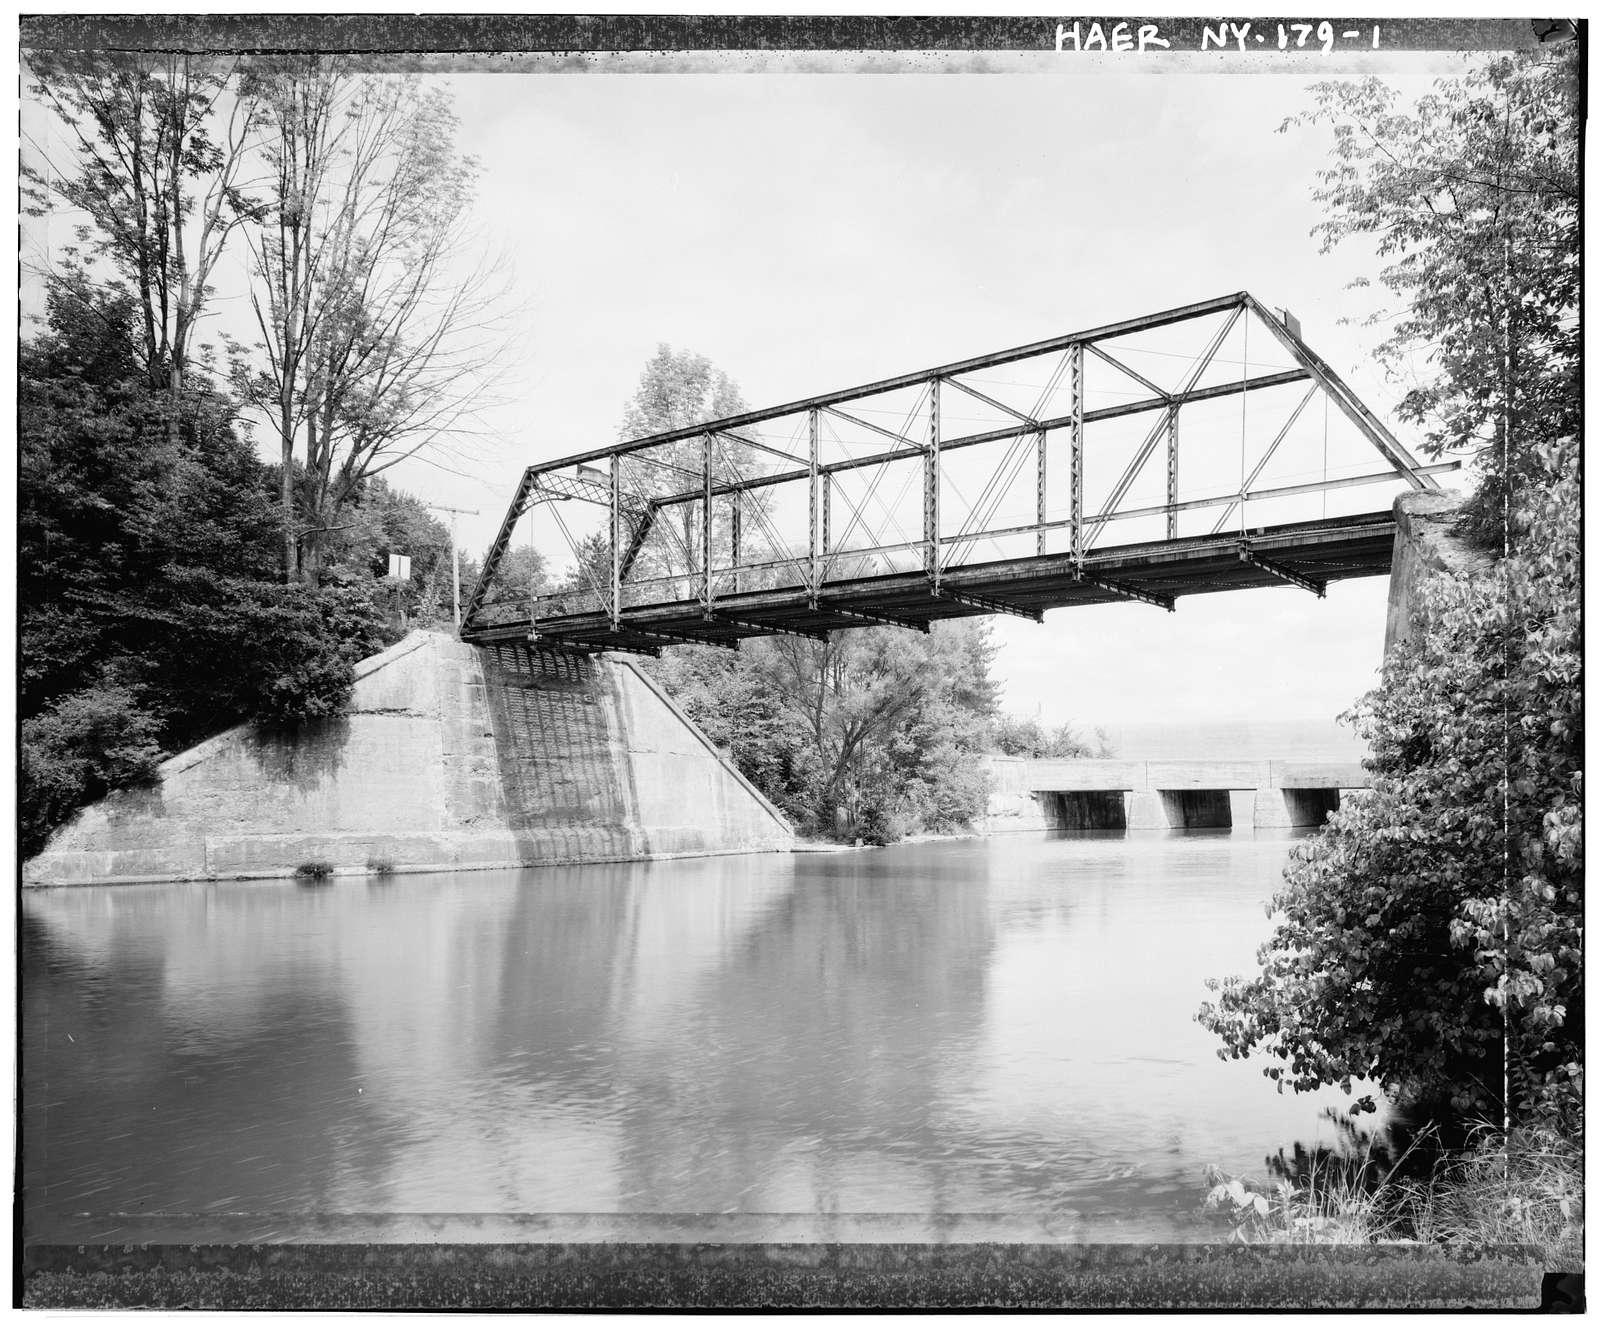 Rome Westernville Road Bridge, Spanning Mohawk River, Rome, Oneida County, NY